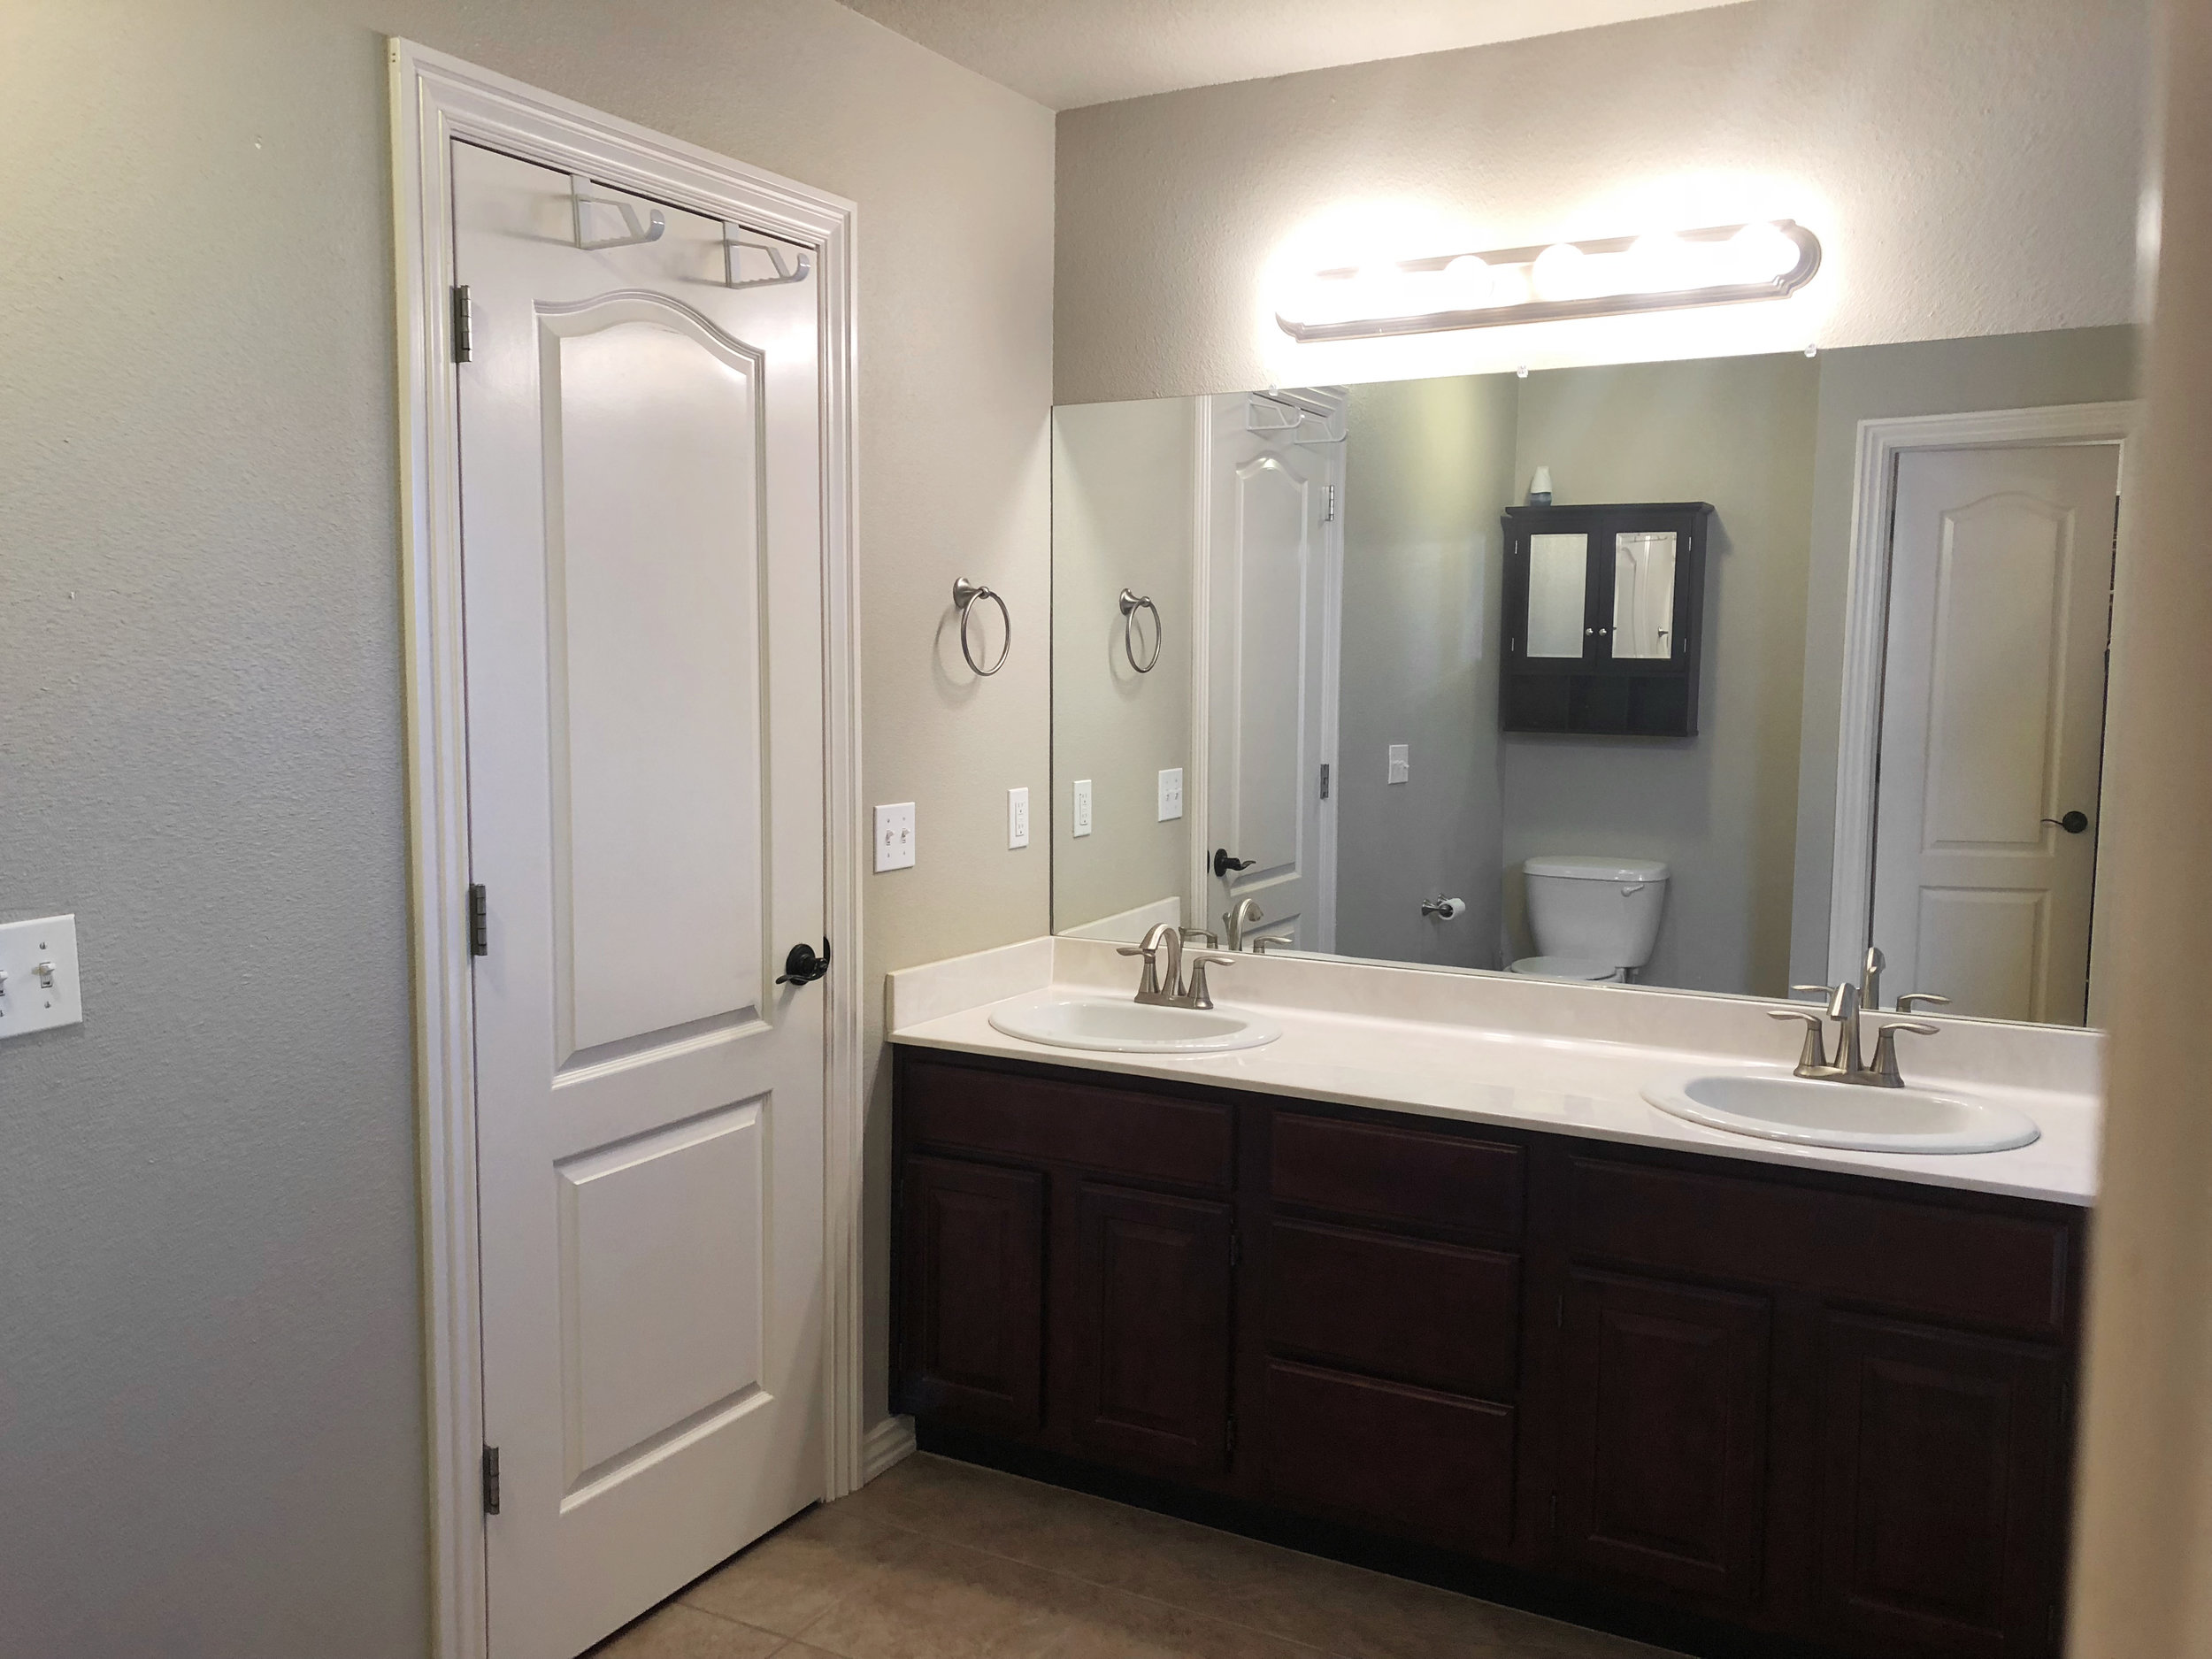 CornwallAve_Bathroom3.jpg